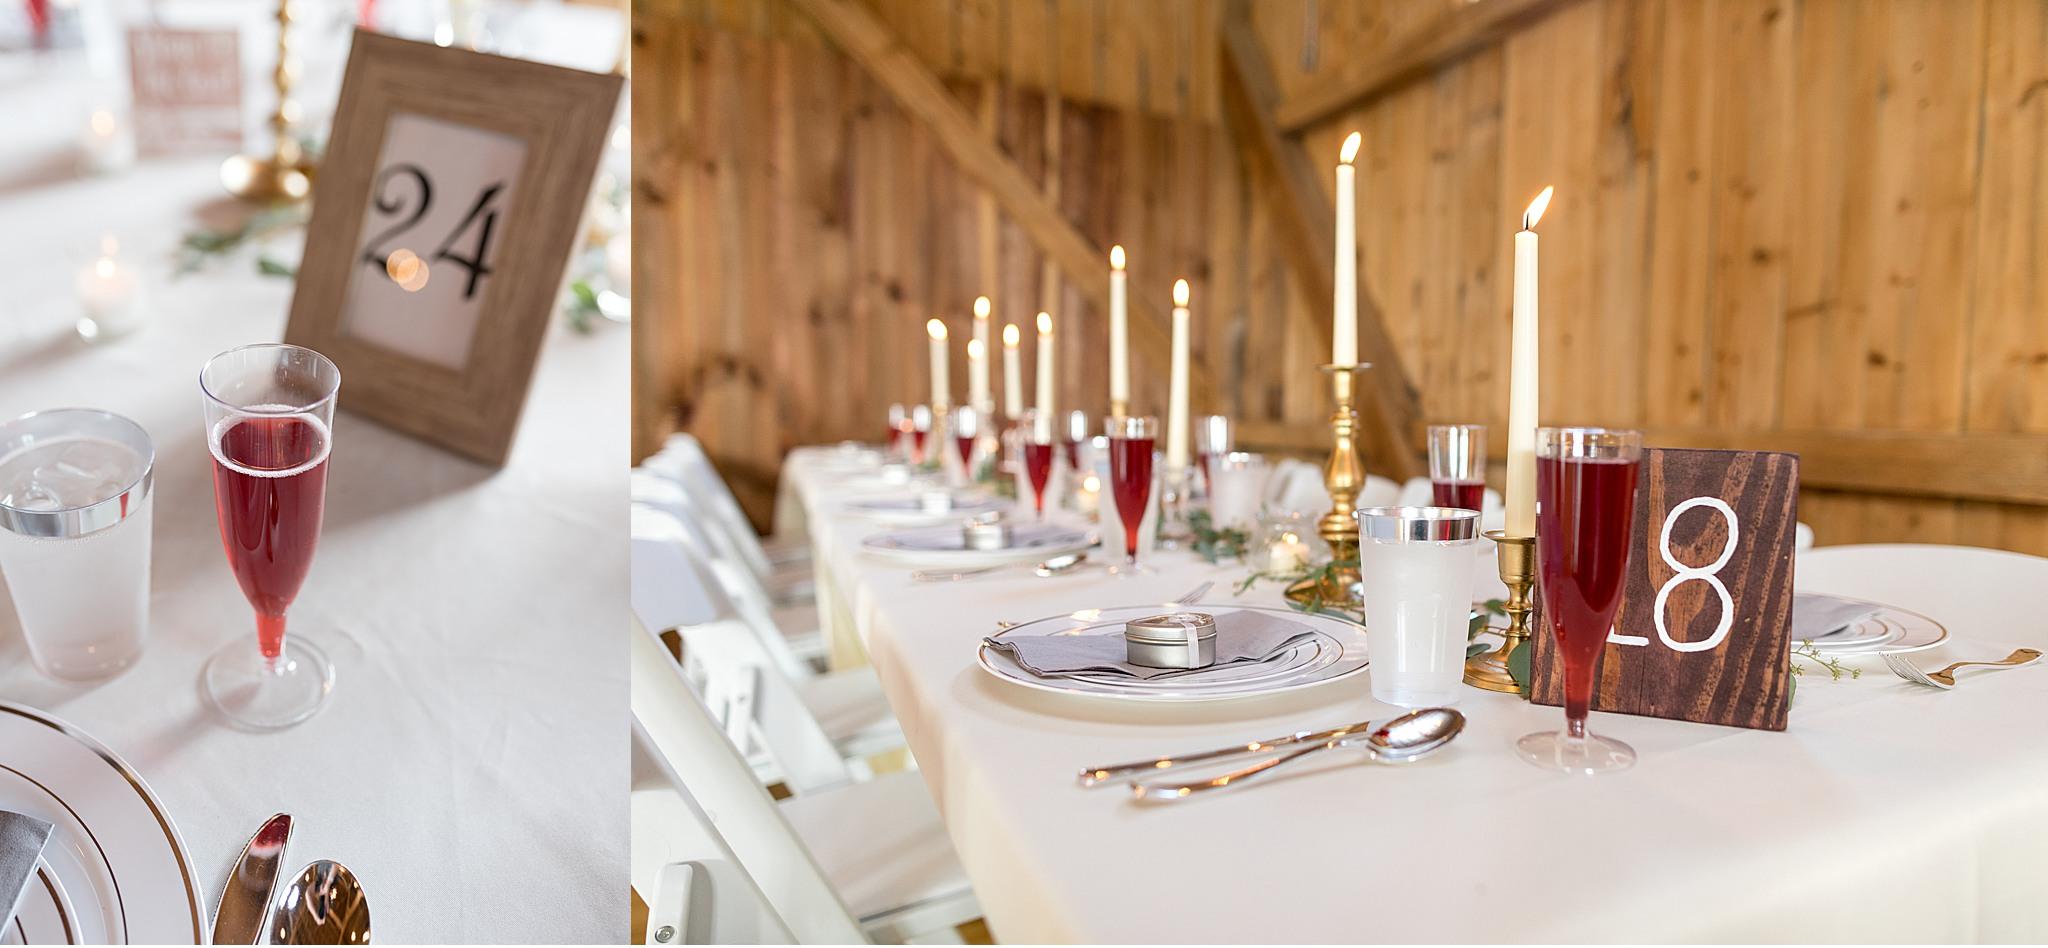 Simmontown wedding Barn Lancaster PA wedding engagement Photography_3636.jpg